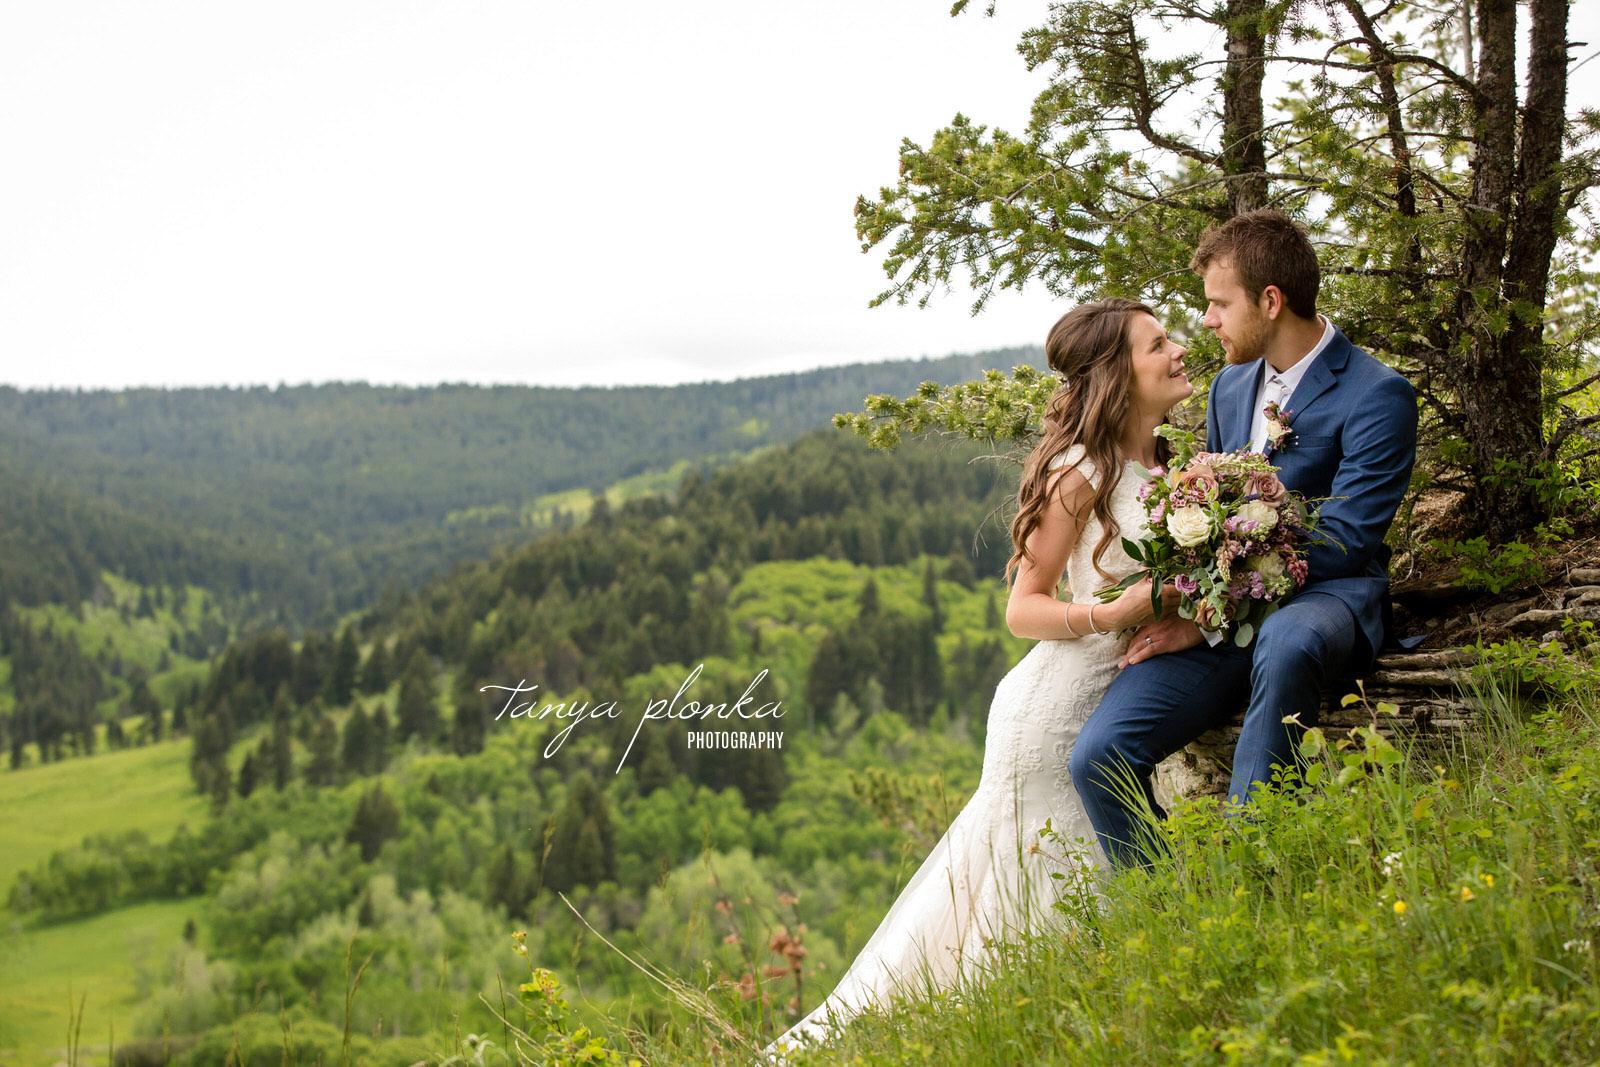 Foothills scenic view wedding couple